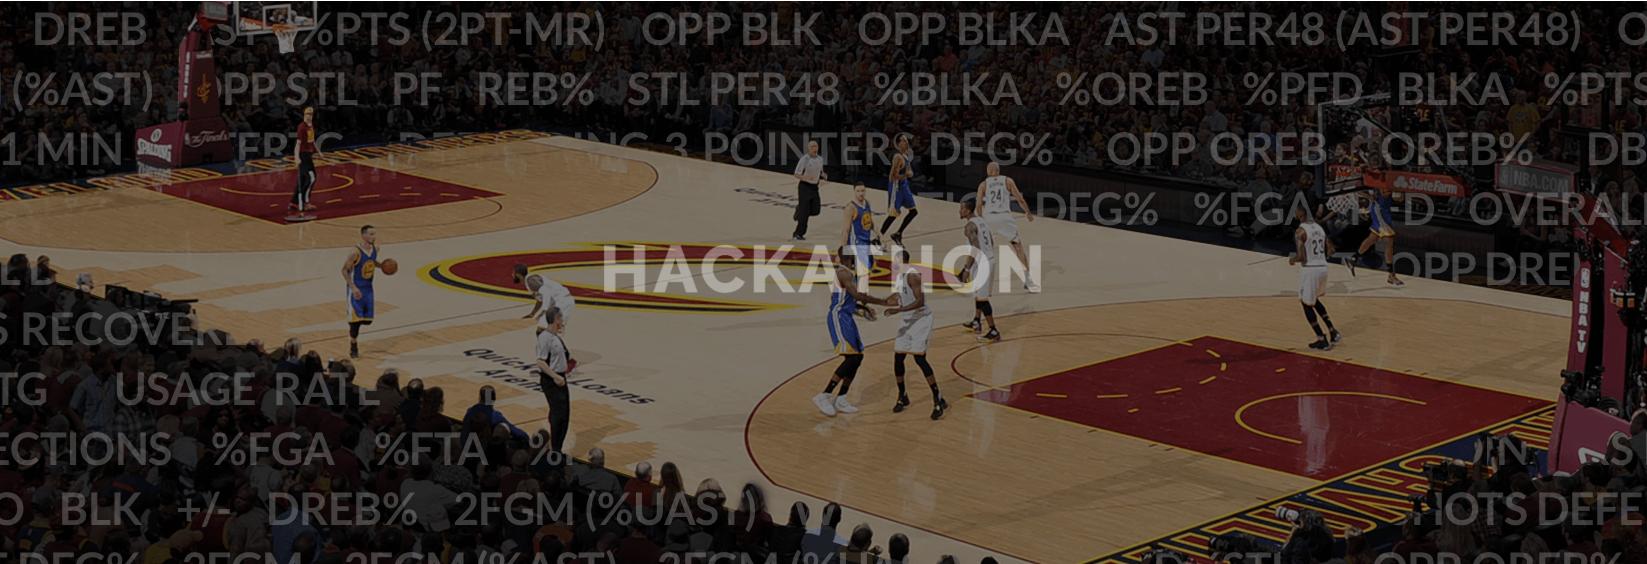 hackathon-cover